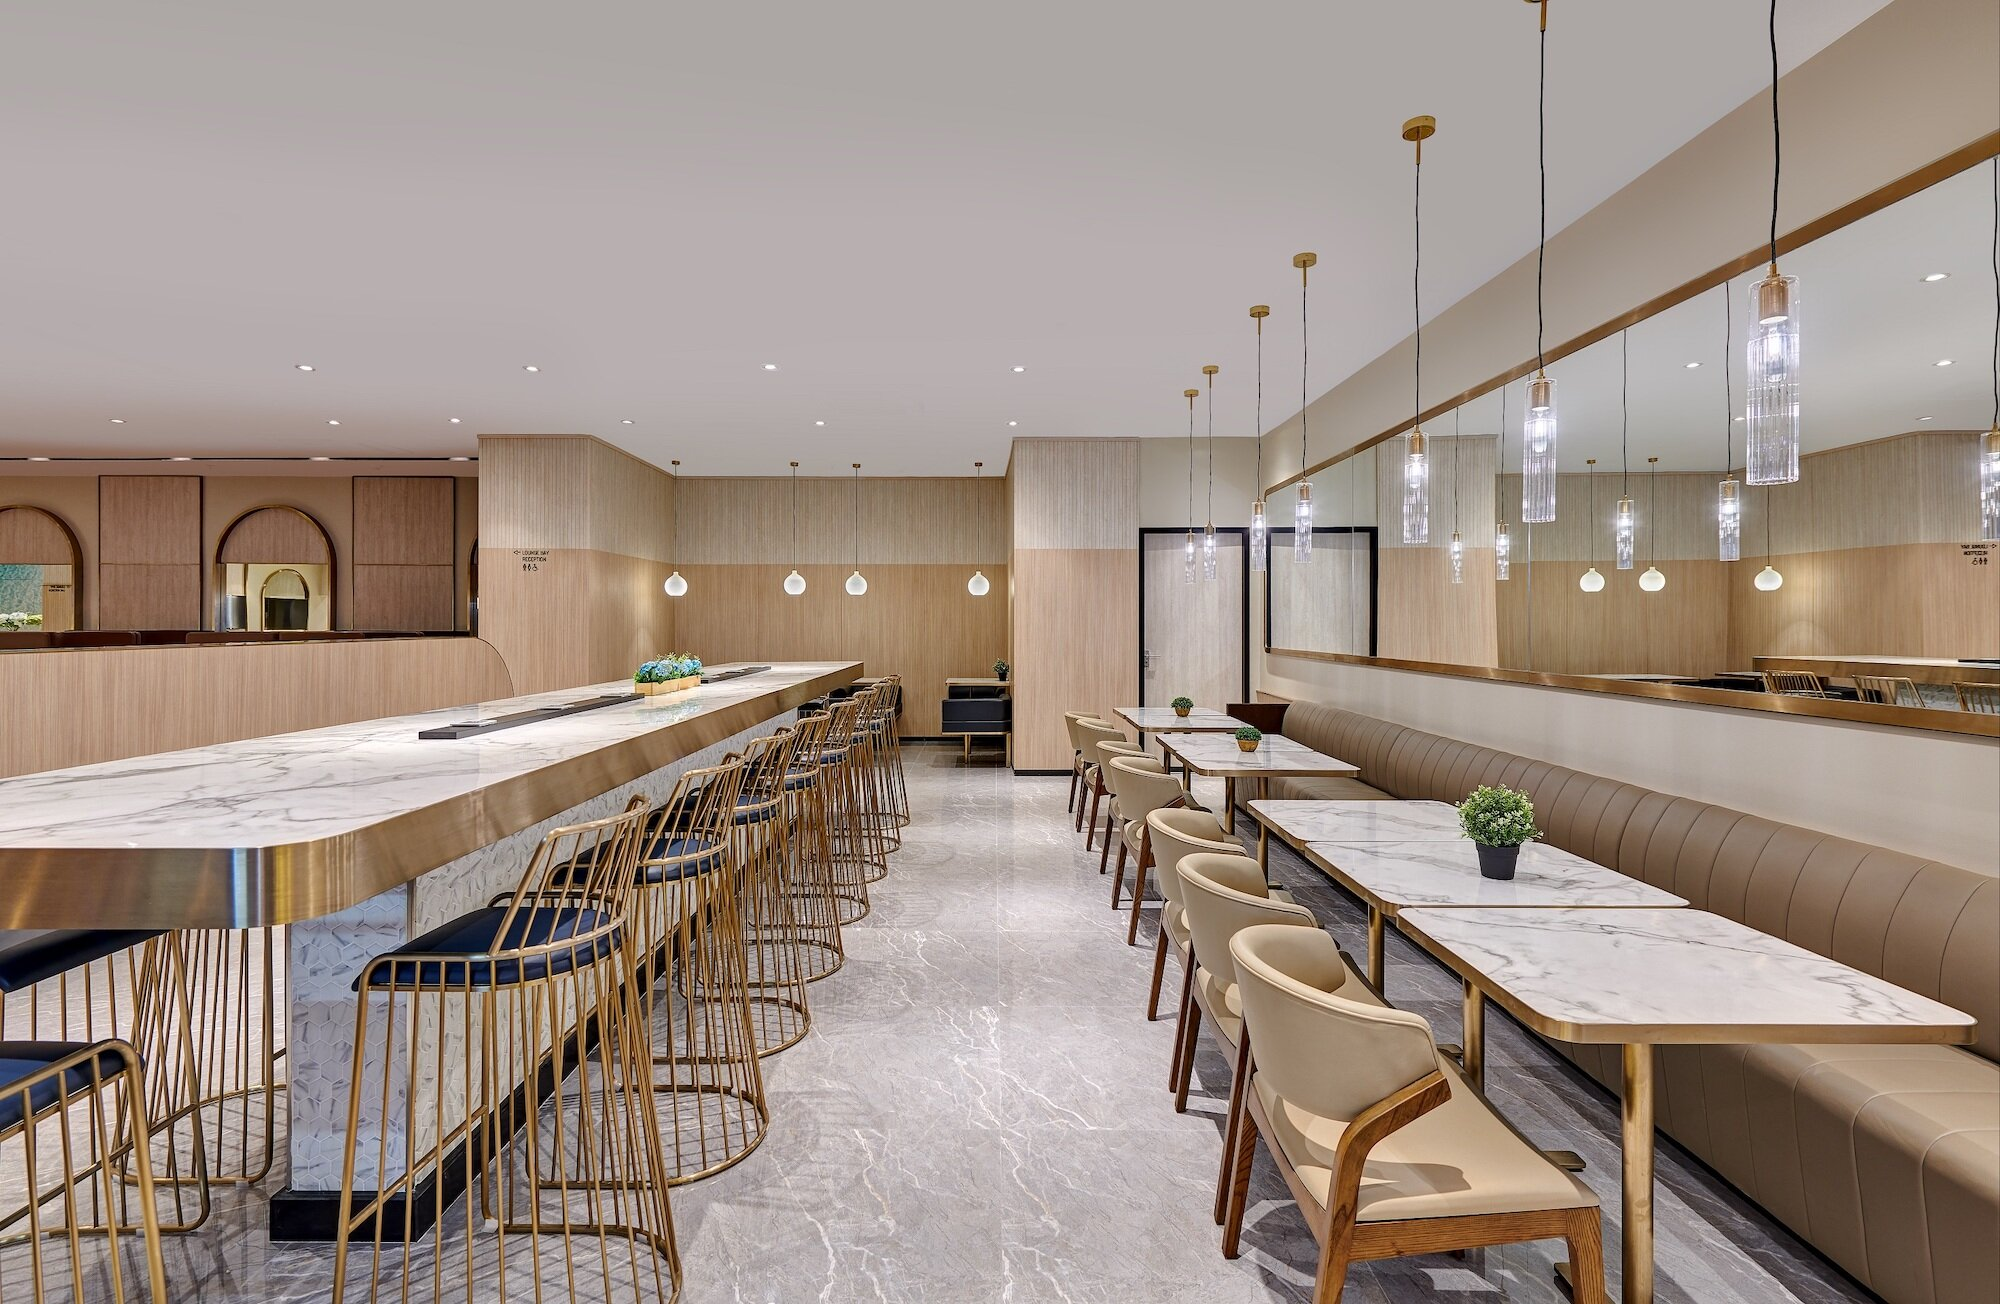 The dining area at the Mactan Cebu Domestic Arrivals Plaza Premium Lounge.